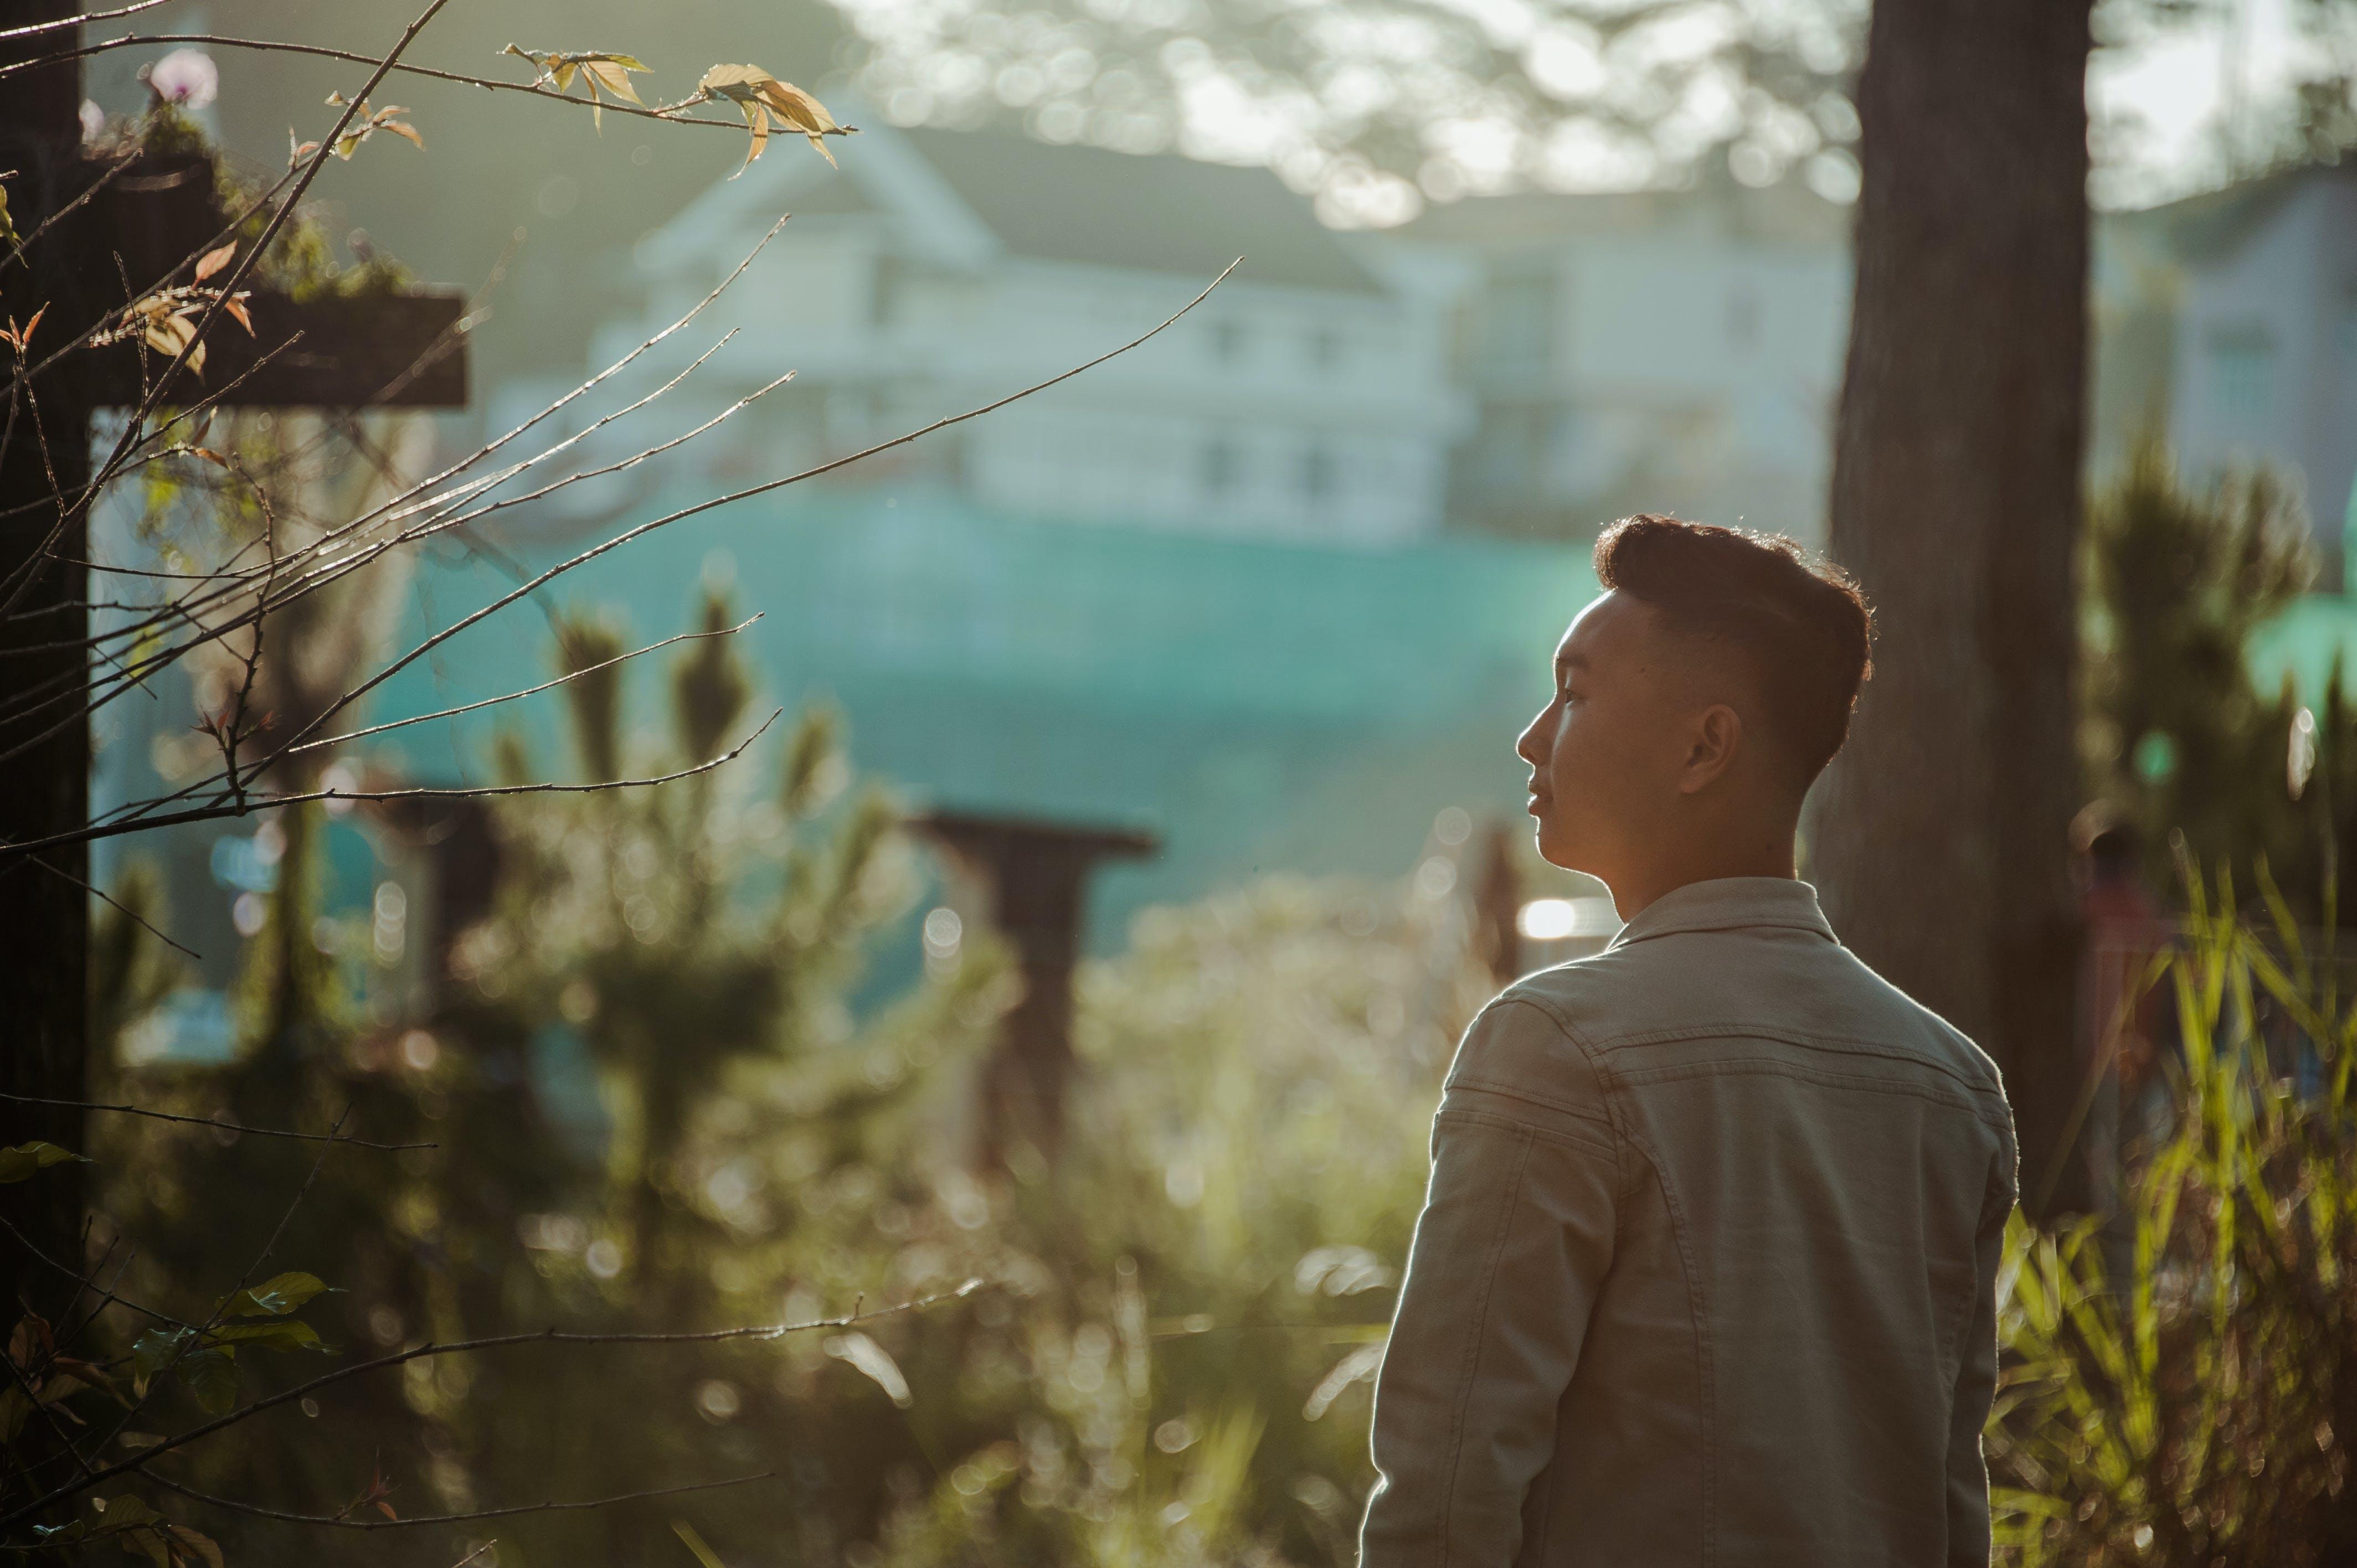 Man Wearing Gray Dress Shirt Standing Near Green Leaf Plant